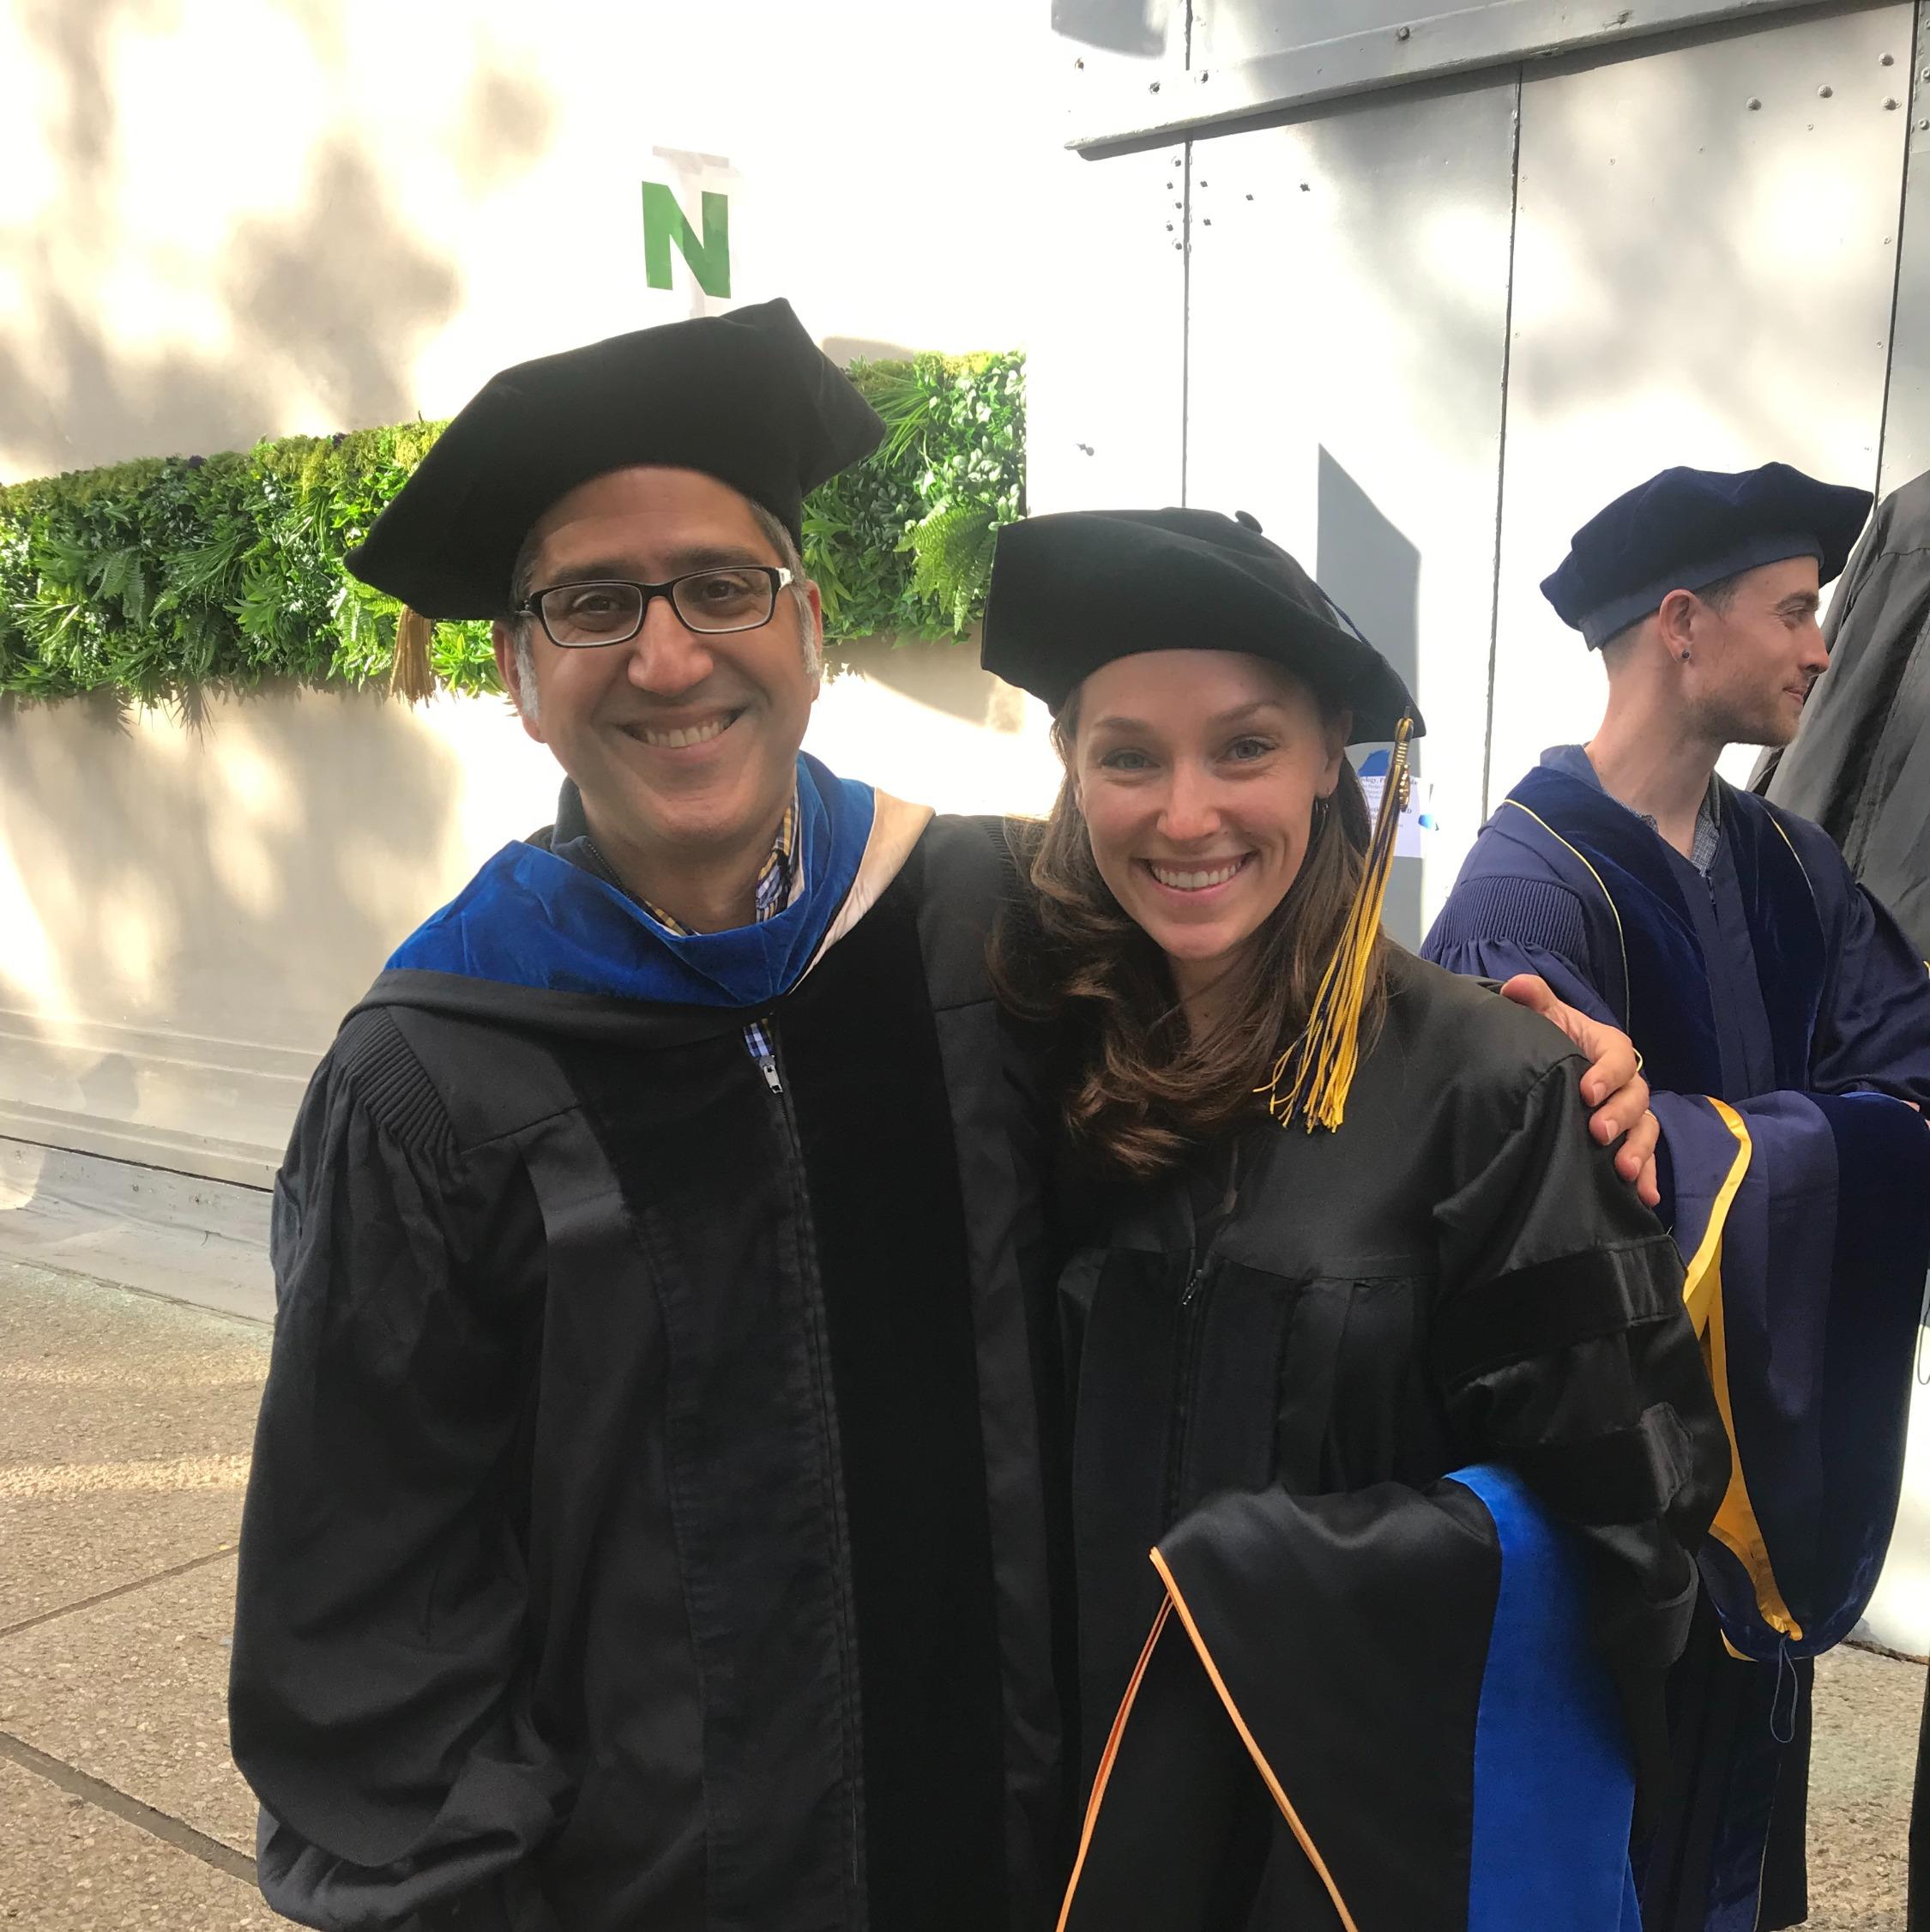 2019 Graduation, Carly Grant, PhD!